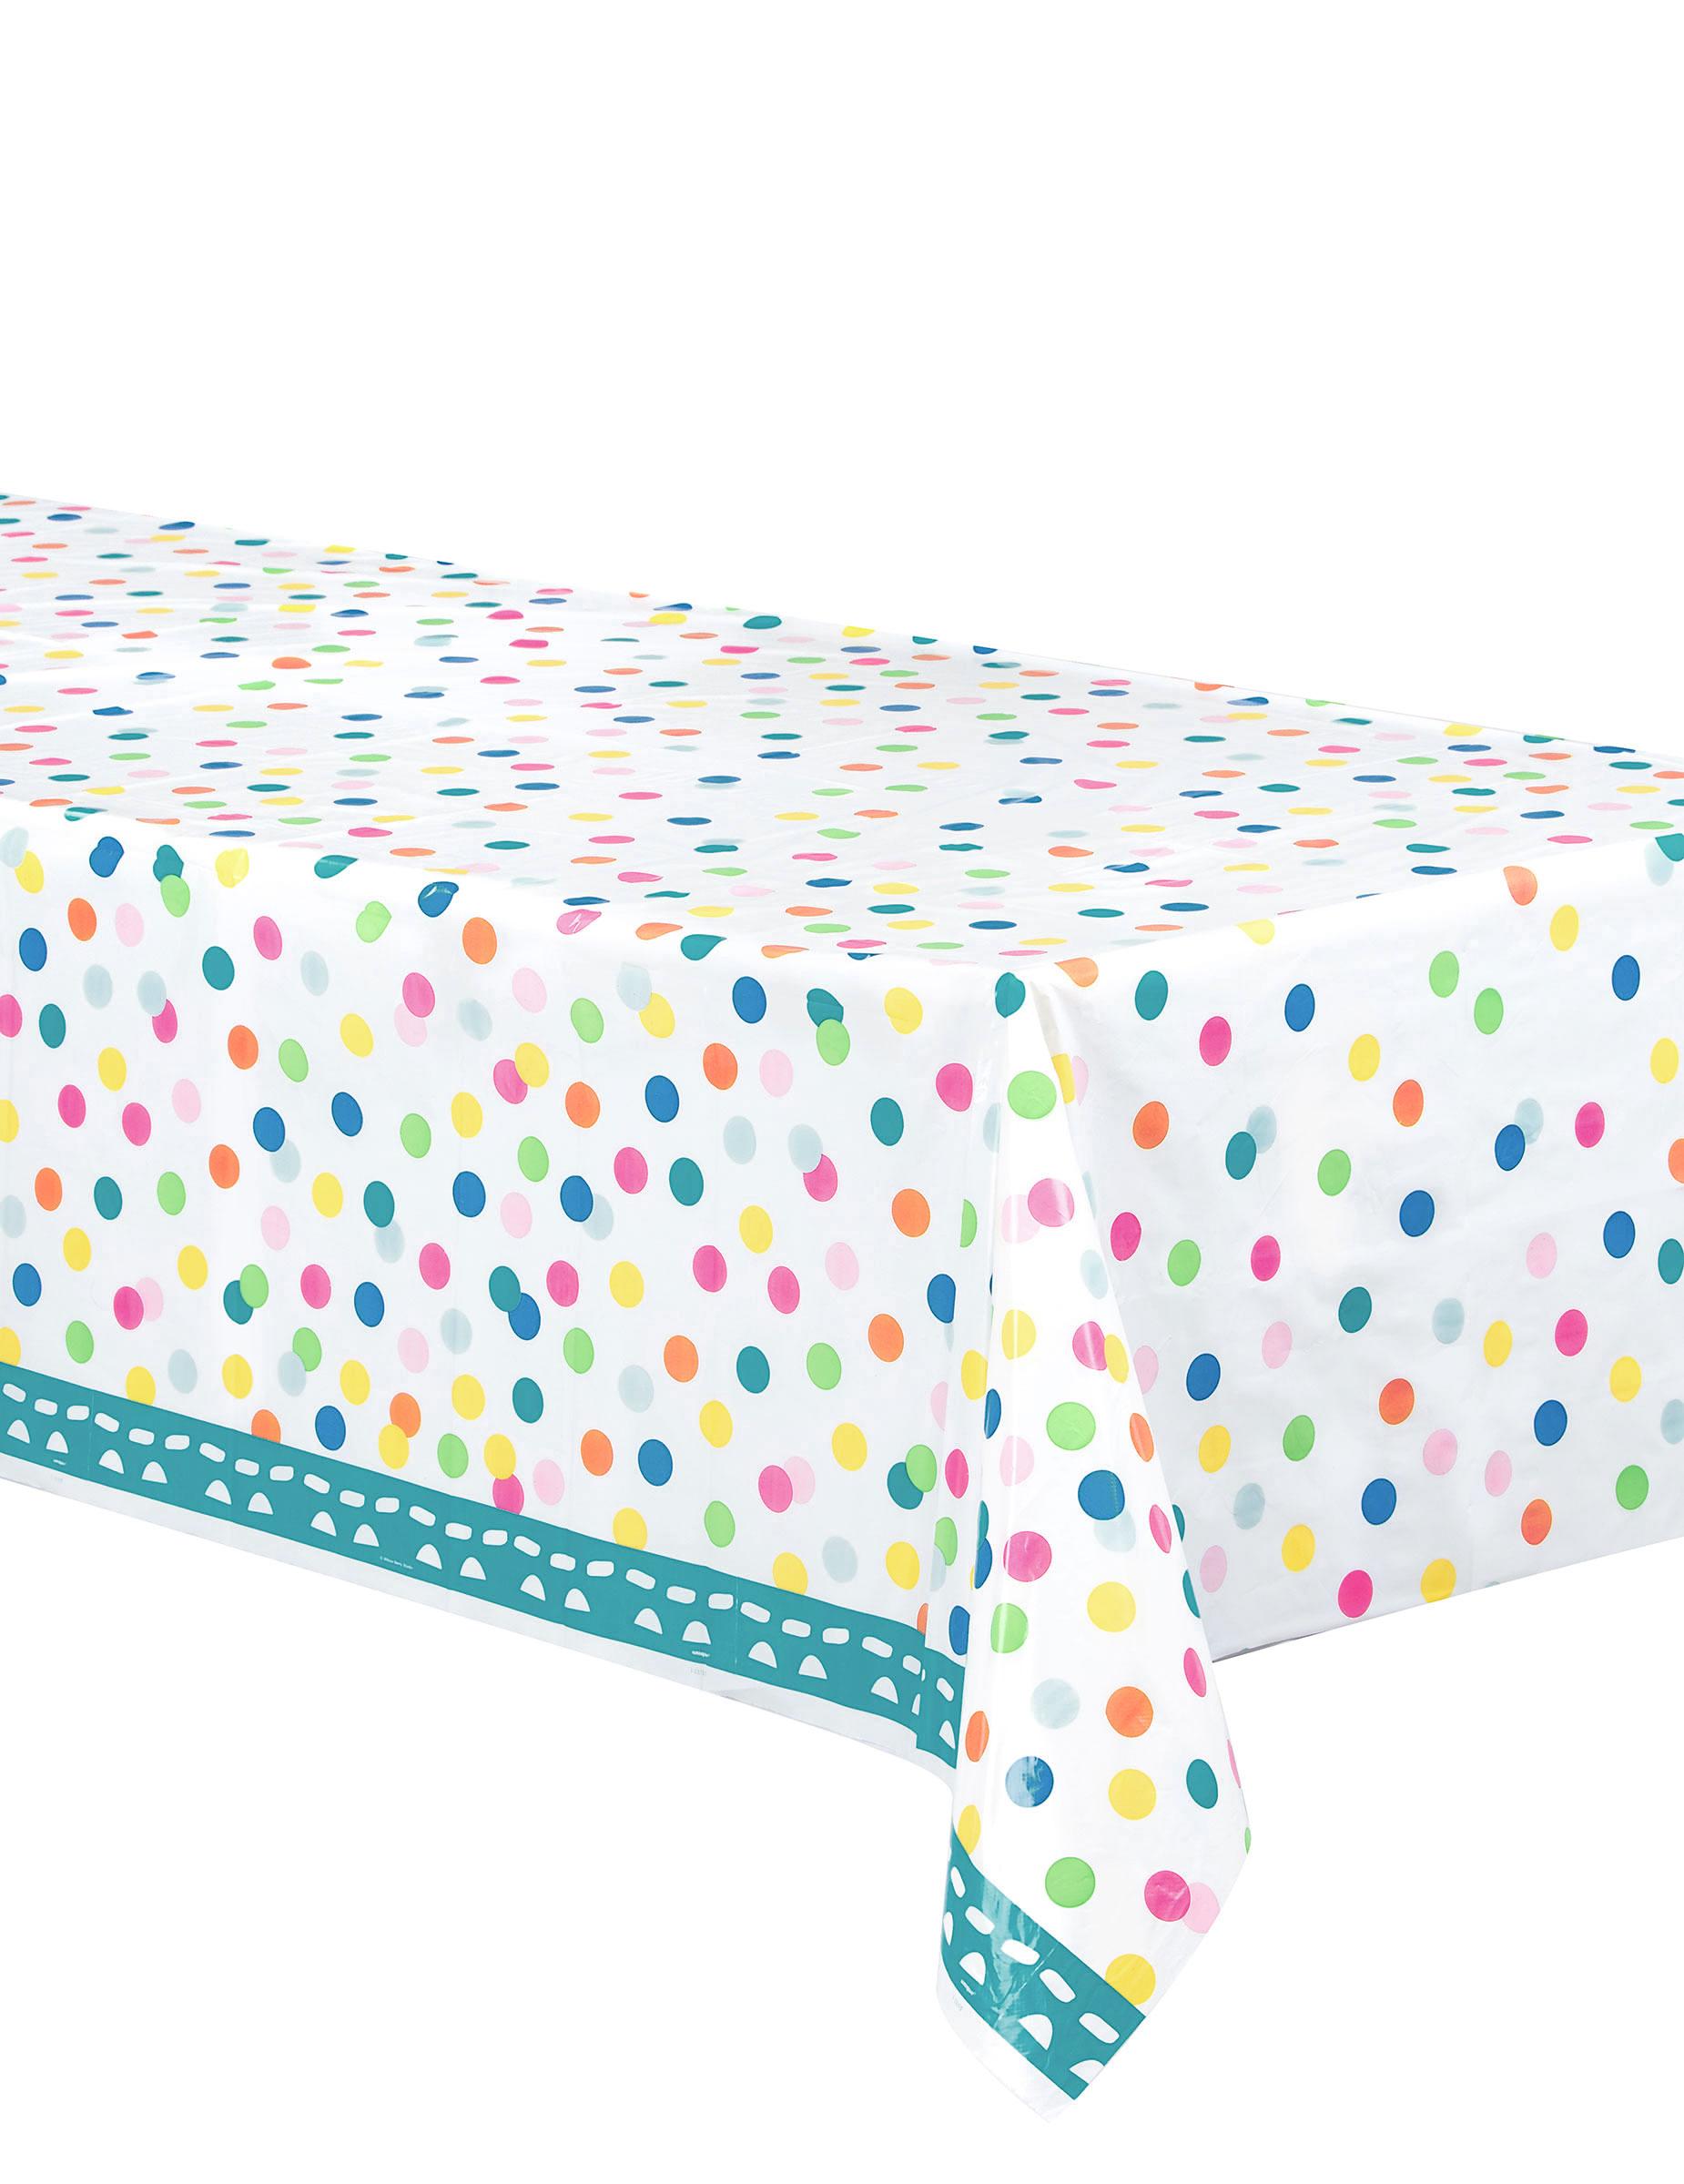 nappe plastique happy birthday turquoise d coration anniversaire et f tes th me sur vegaoo party. Black Bedroom Furniture Sets. Home Design Ideas